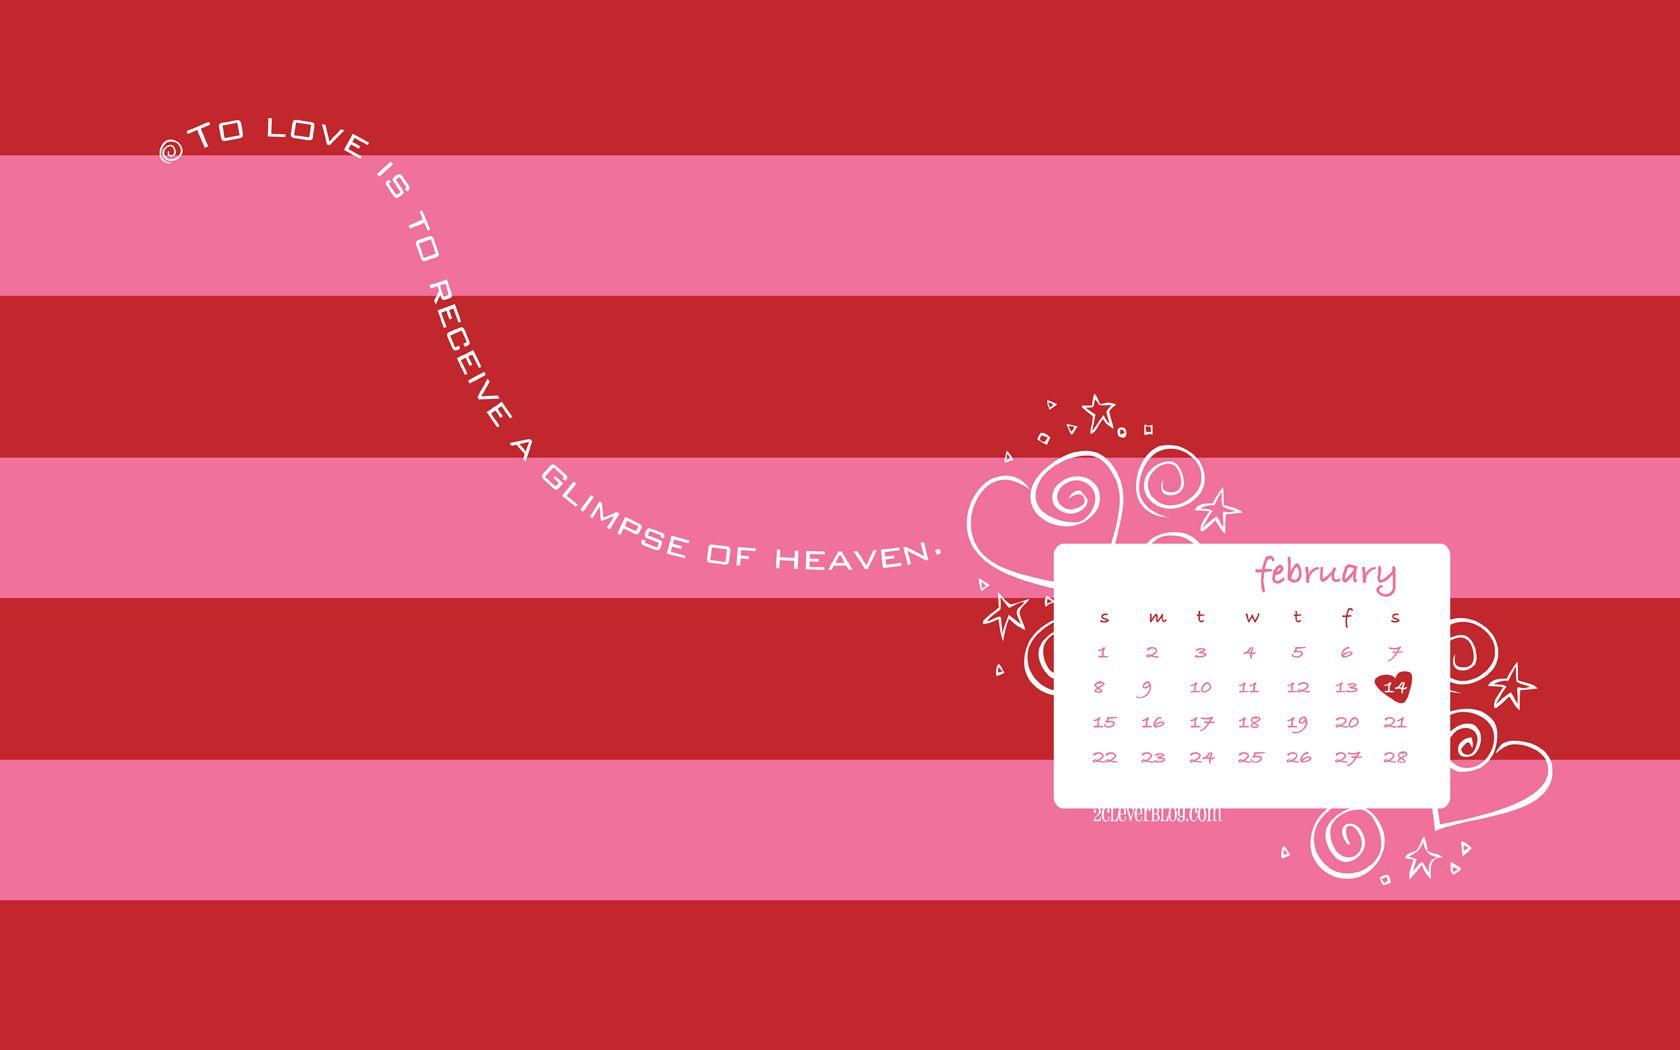 Win Calendar Wallpaper : February desktop backgrounds wallpapers adorable